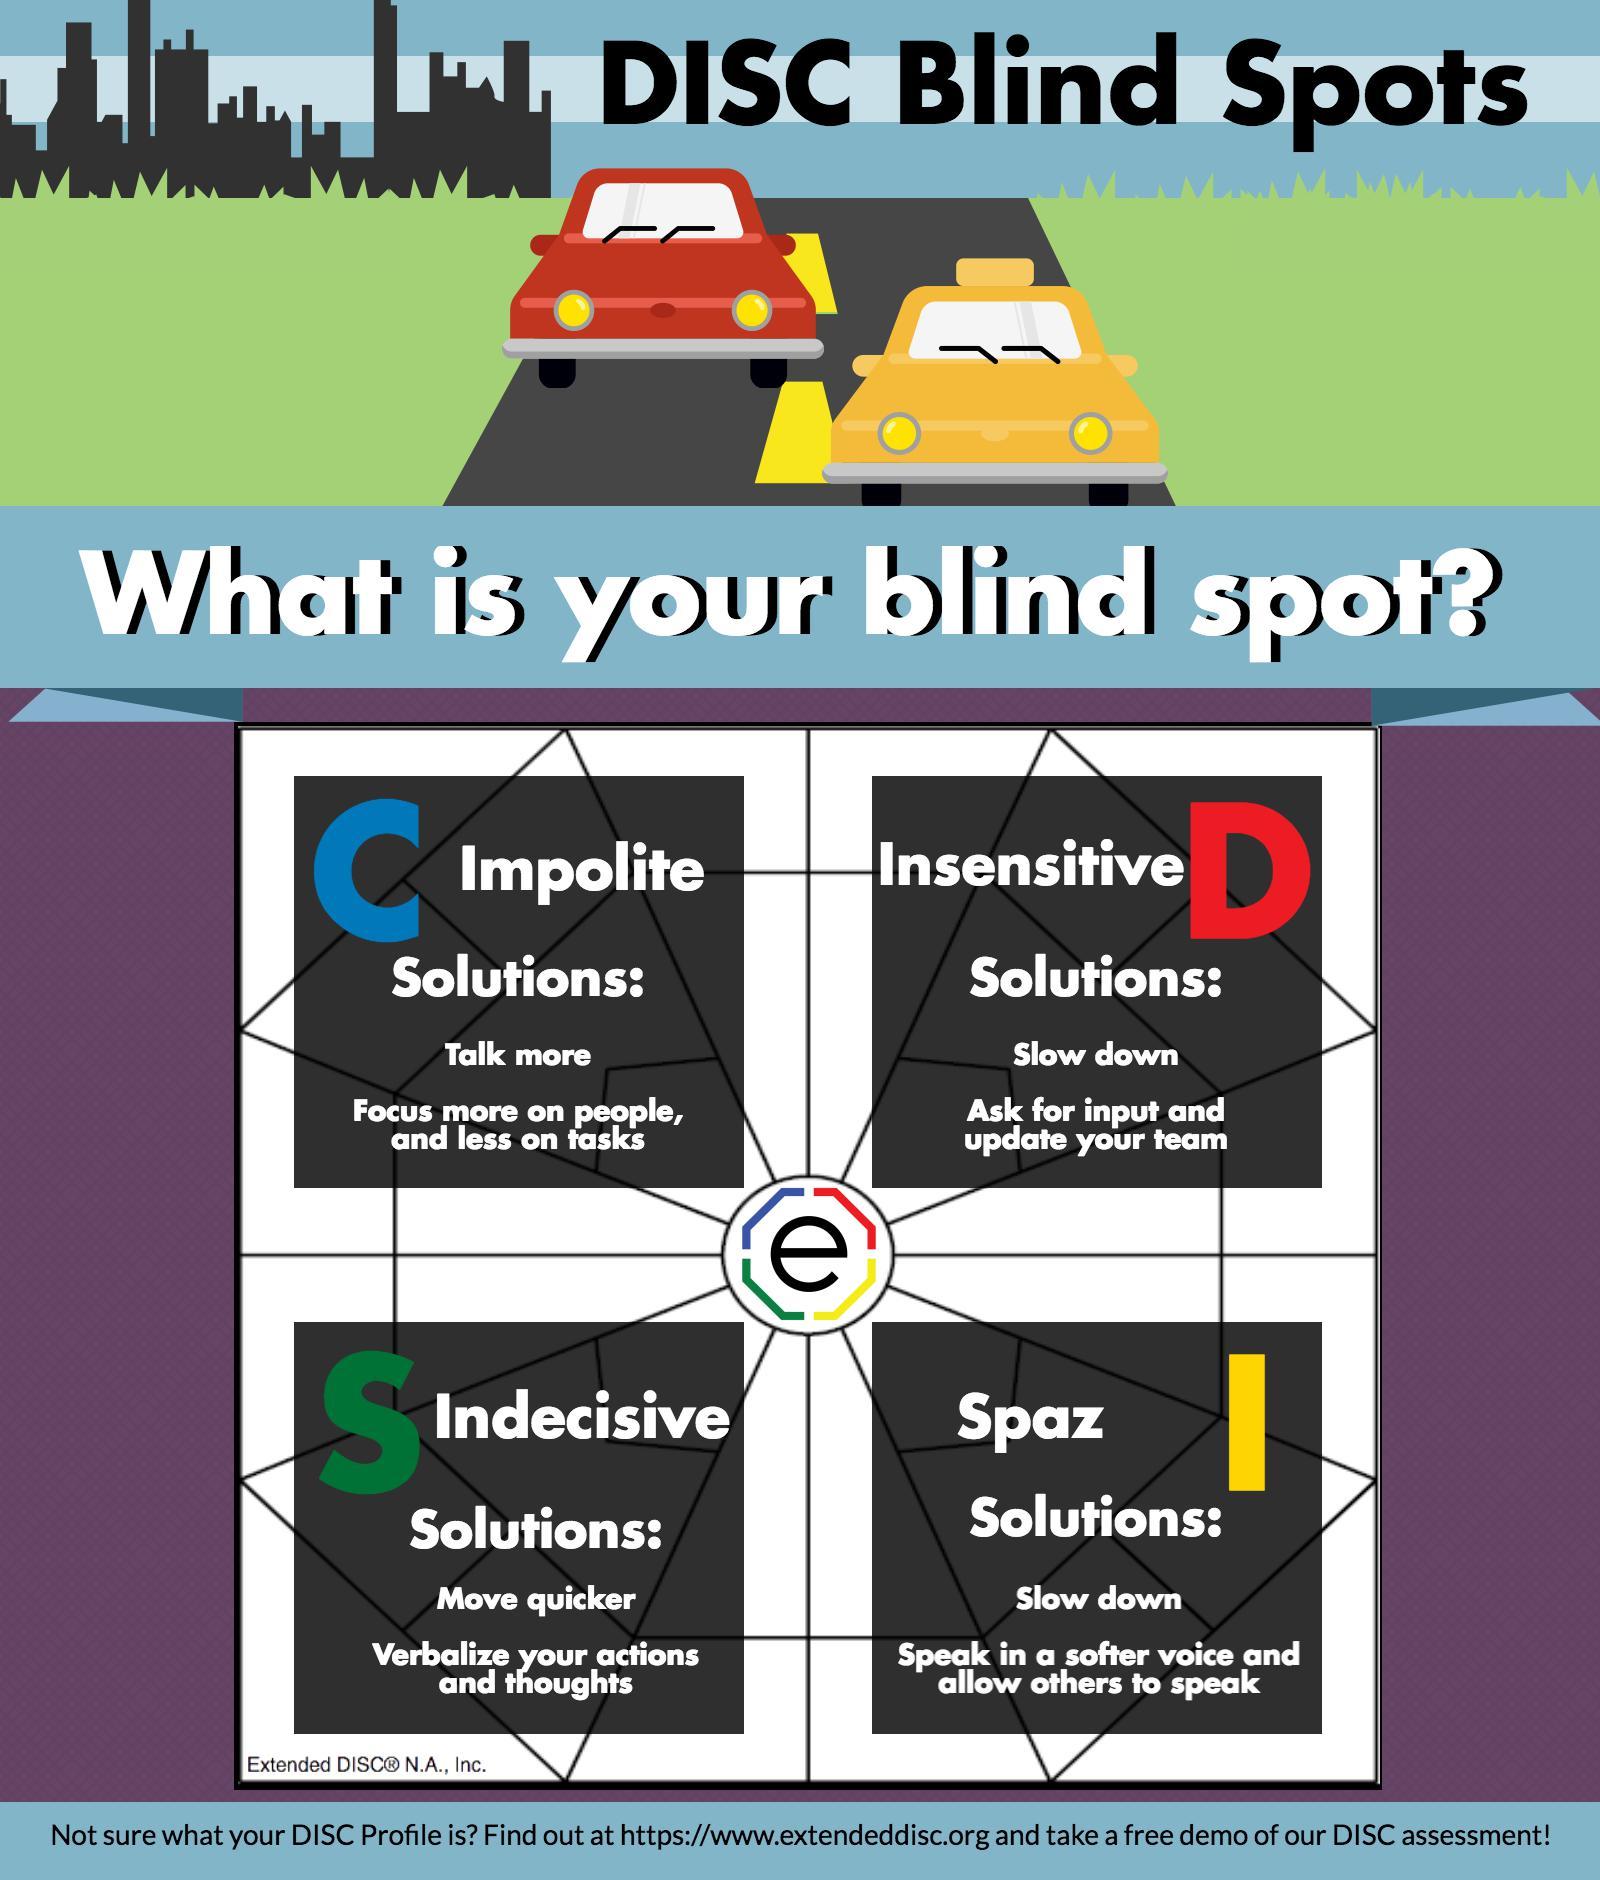 DISC Blind Spots